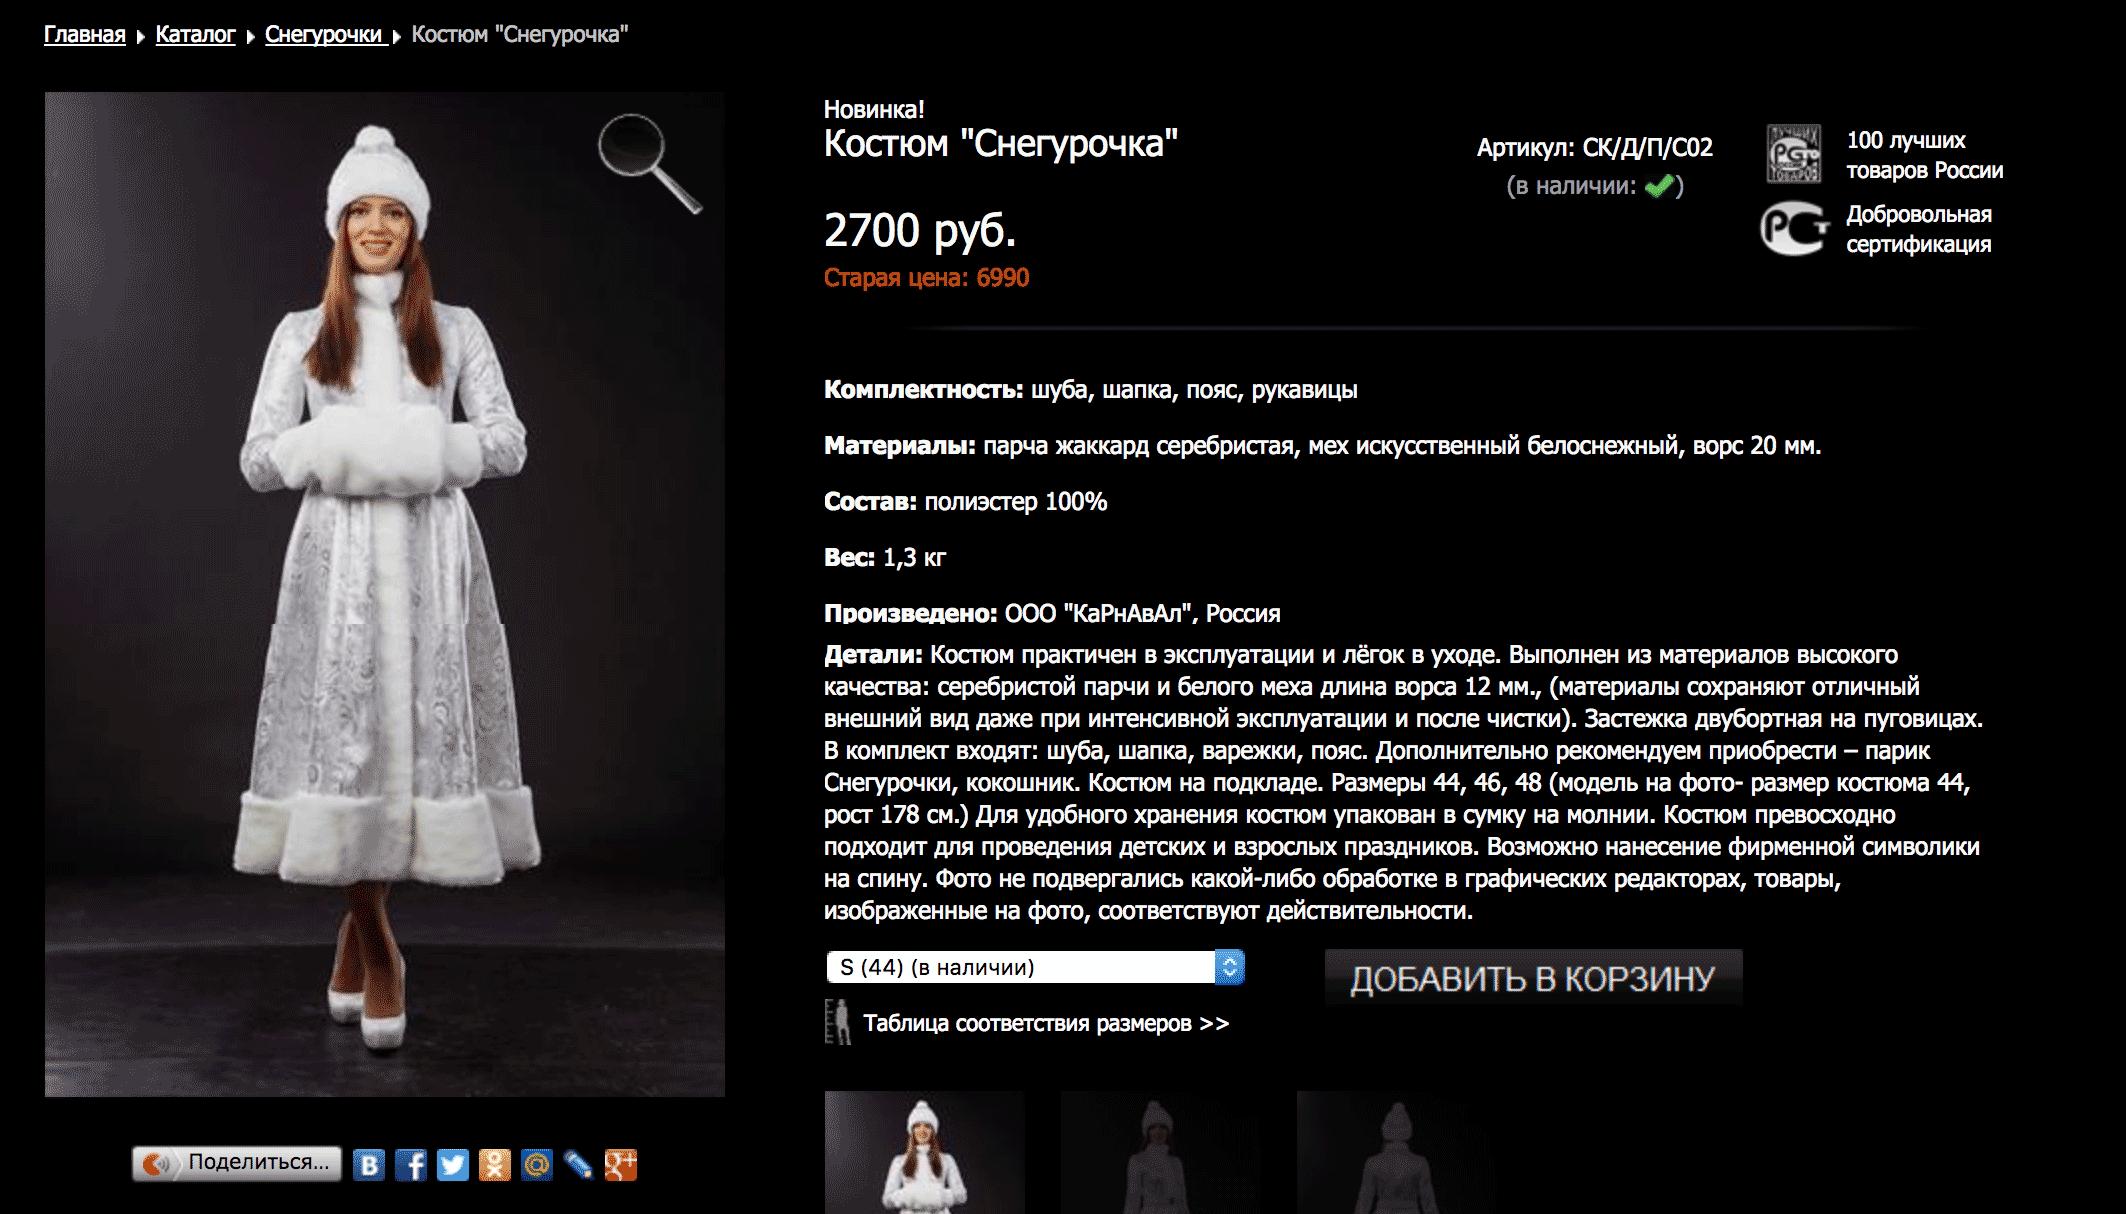 Бывают скидки: {вот костюм Снегурочки за 3000 р.}(http://www.td-karnaval.ru/shop/snowgirls/141) вместо 7000